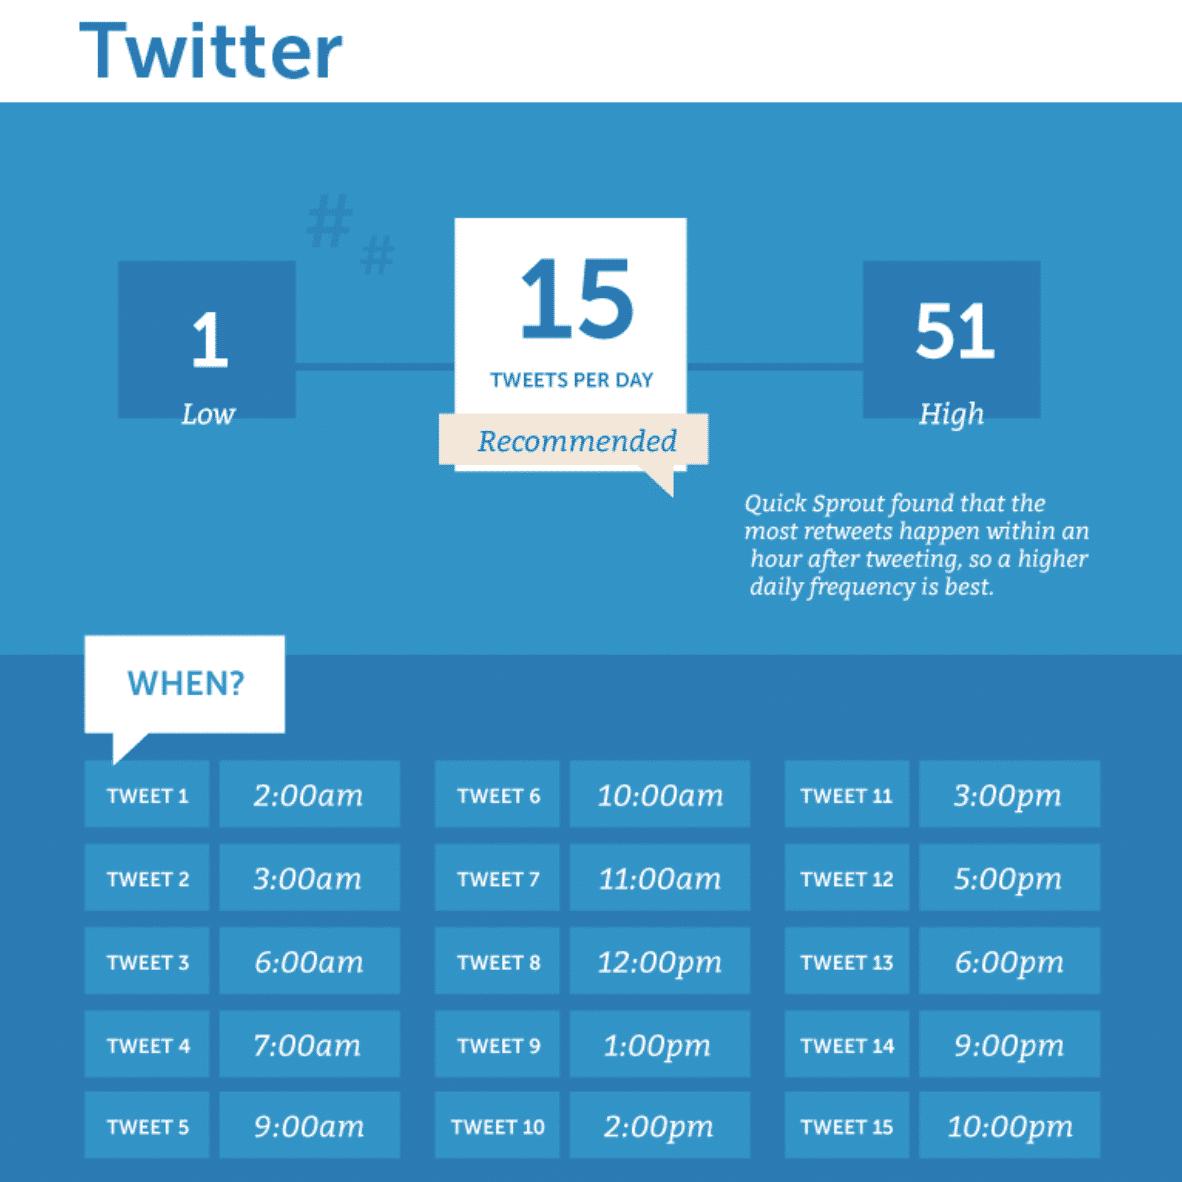 Tweets per day